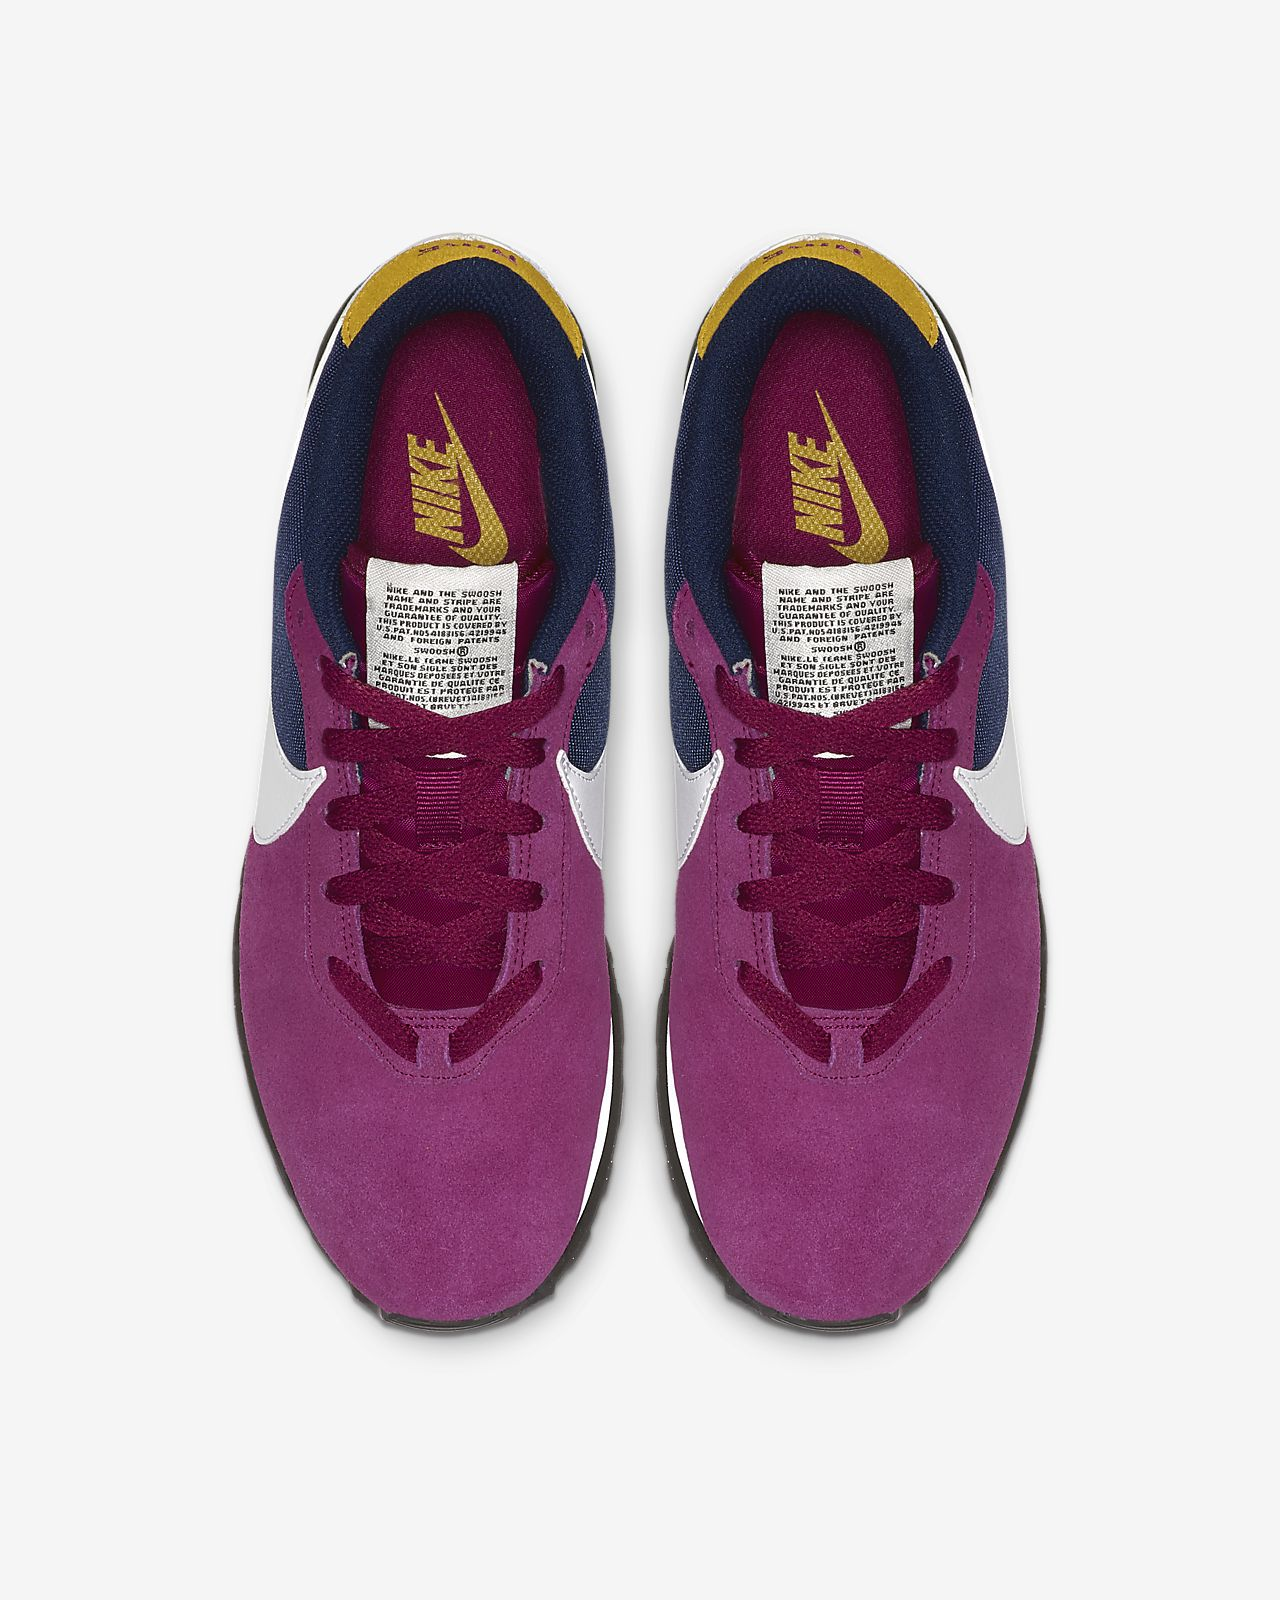 online store 0e153 547b8 ... Nike Pre-Love O.X. Women s Shoe